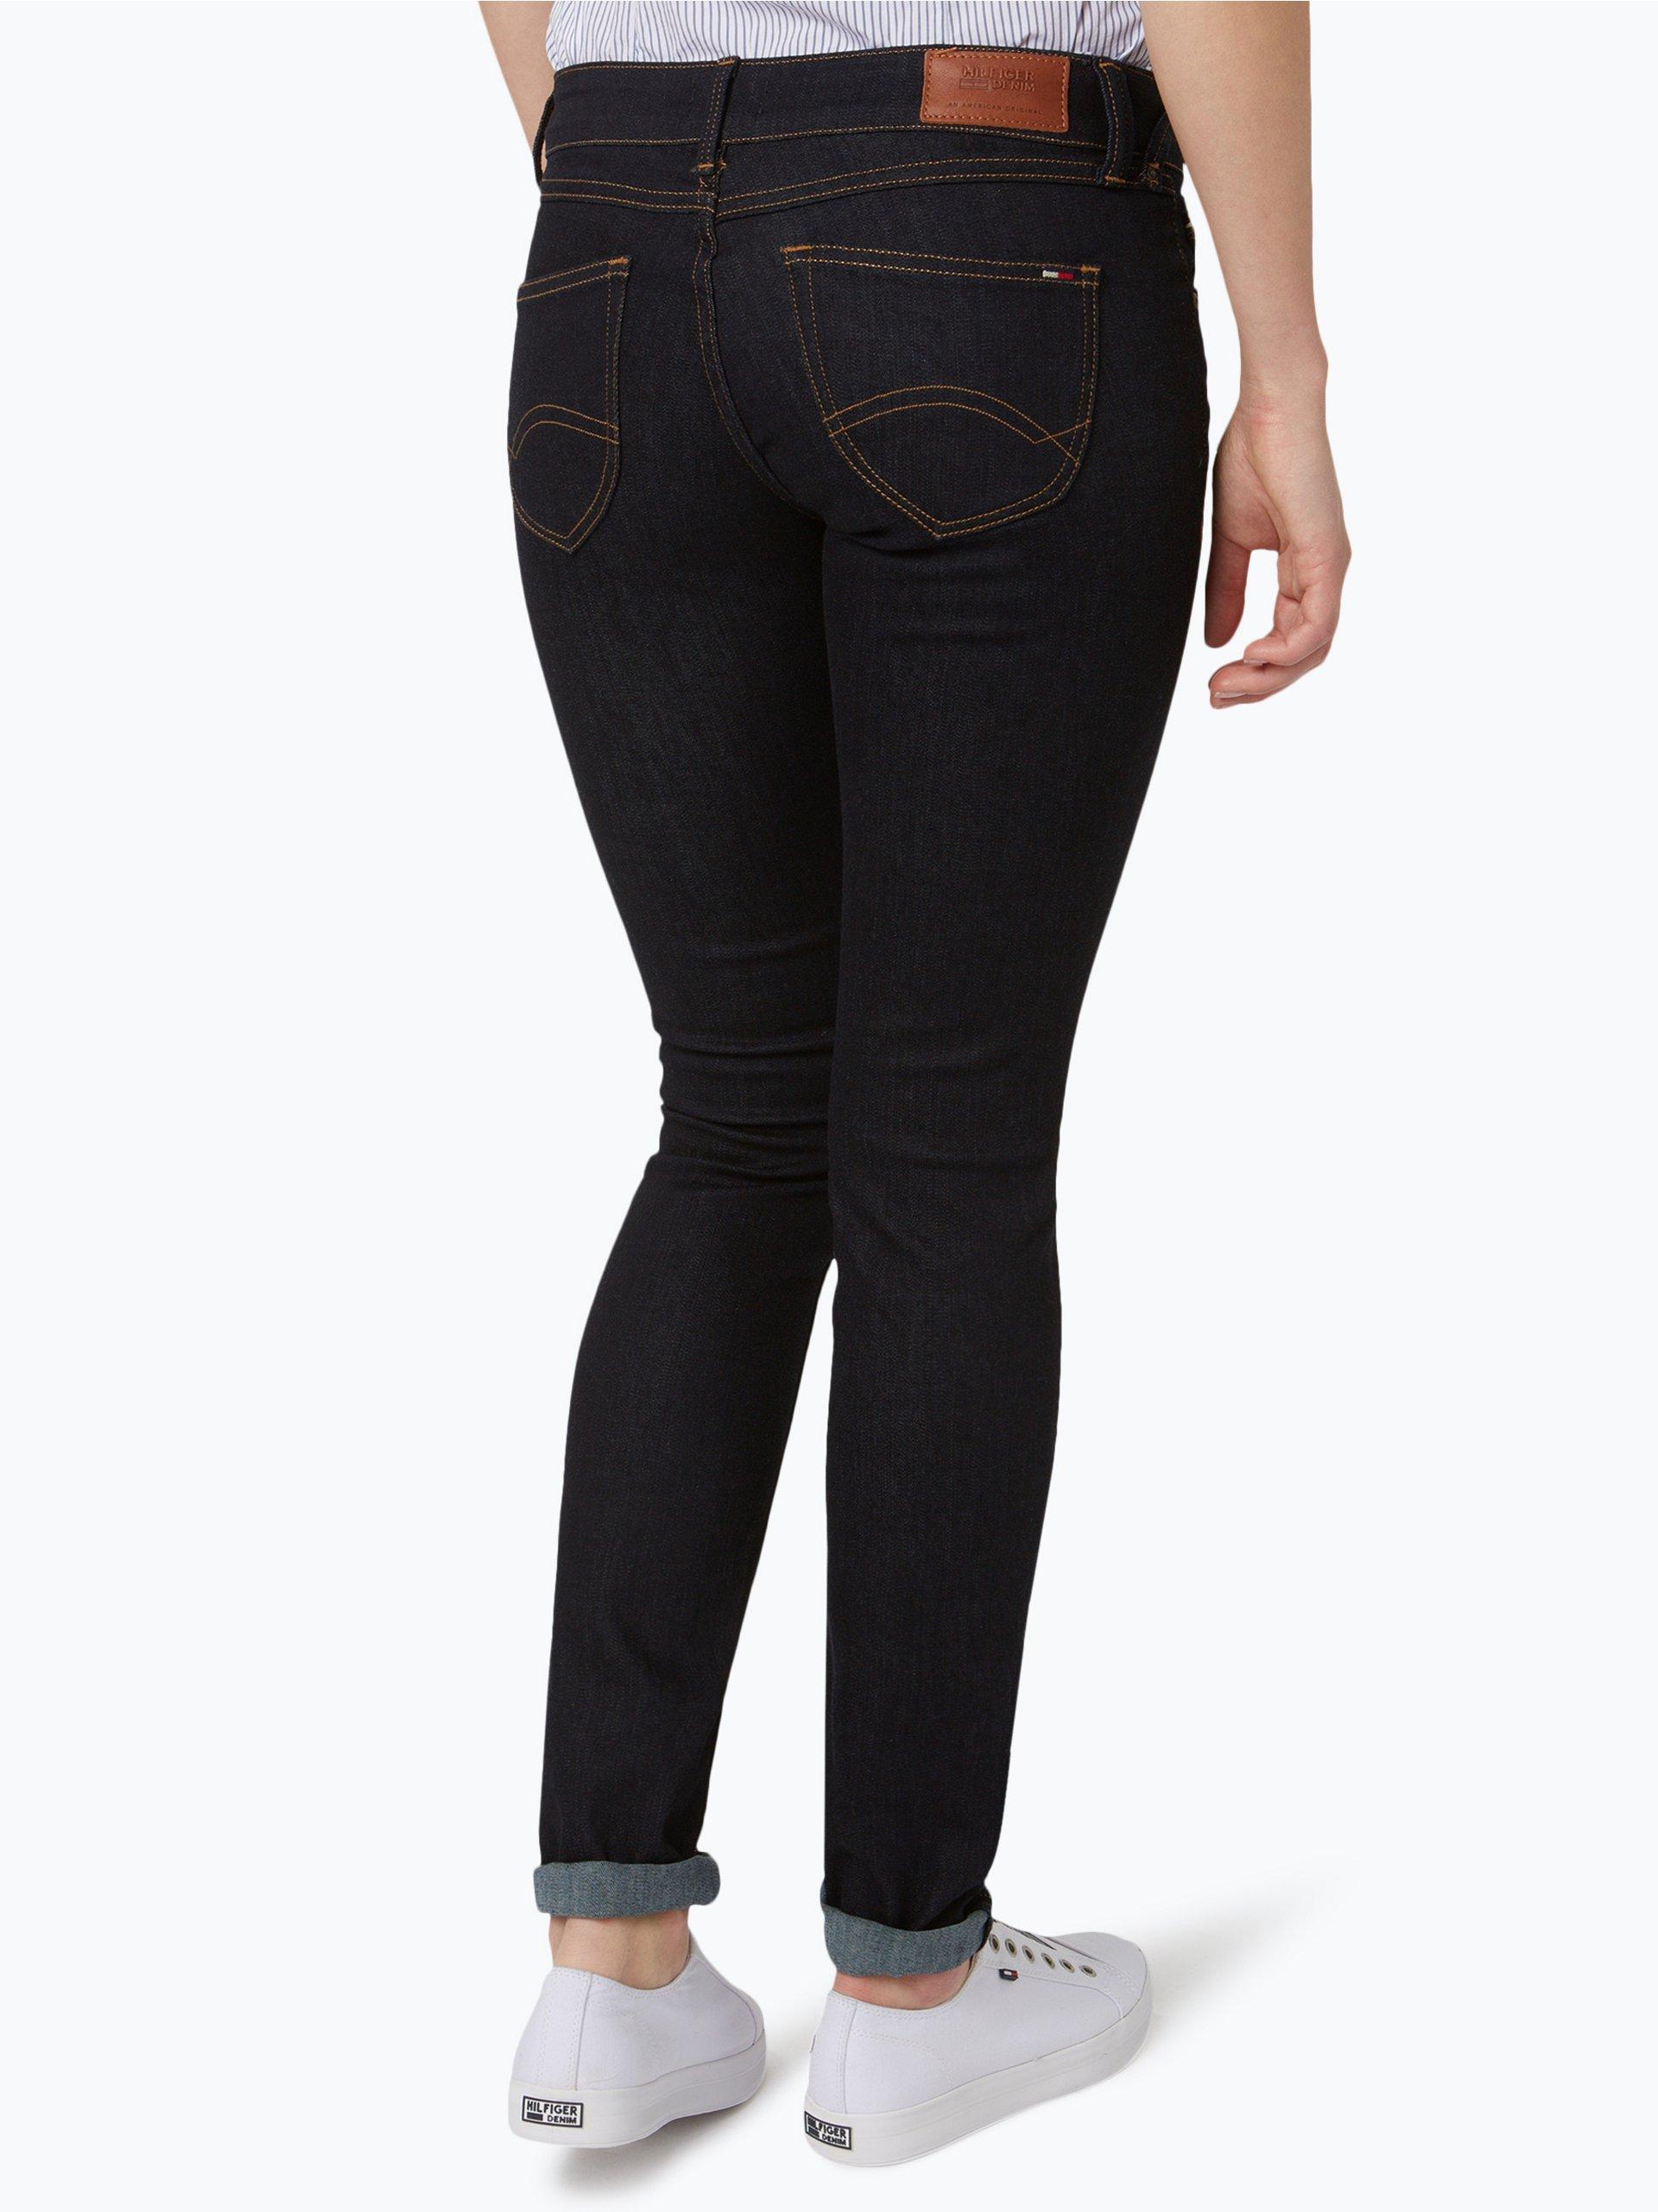 hilfiger denim damen jeans sophie blau uni online kaufen. Black Bedroom Furniture Sets. Home Design Ideas